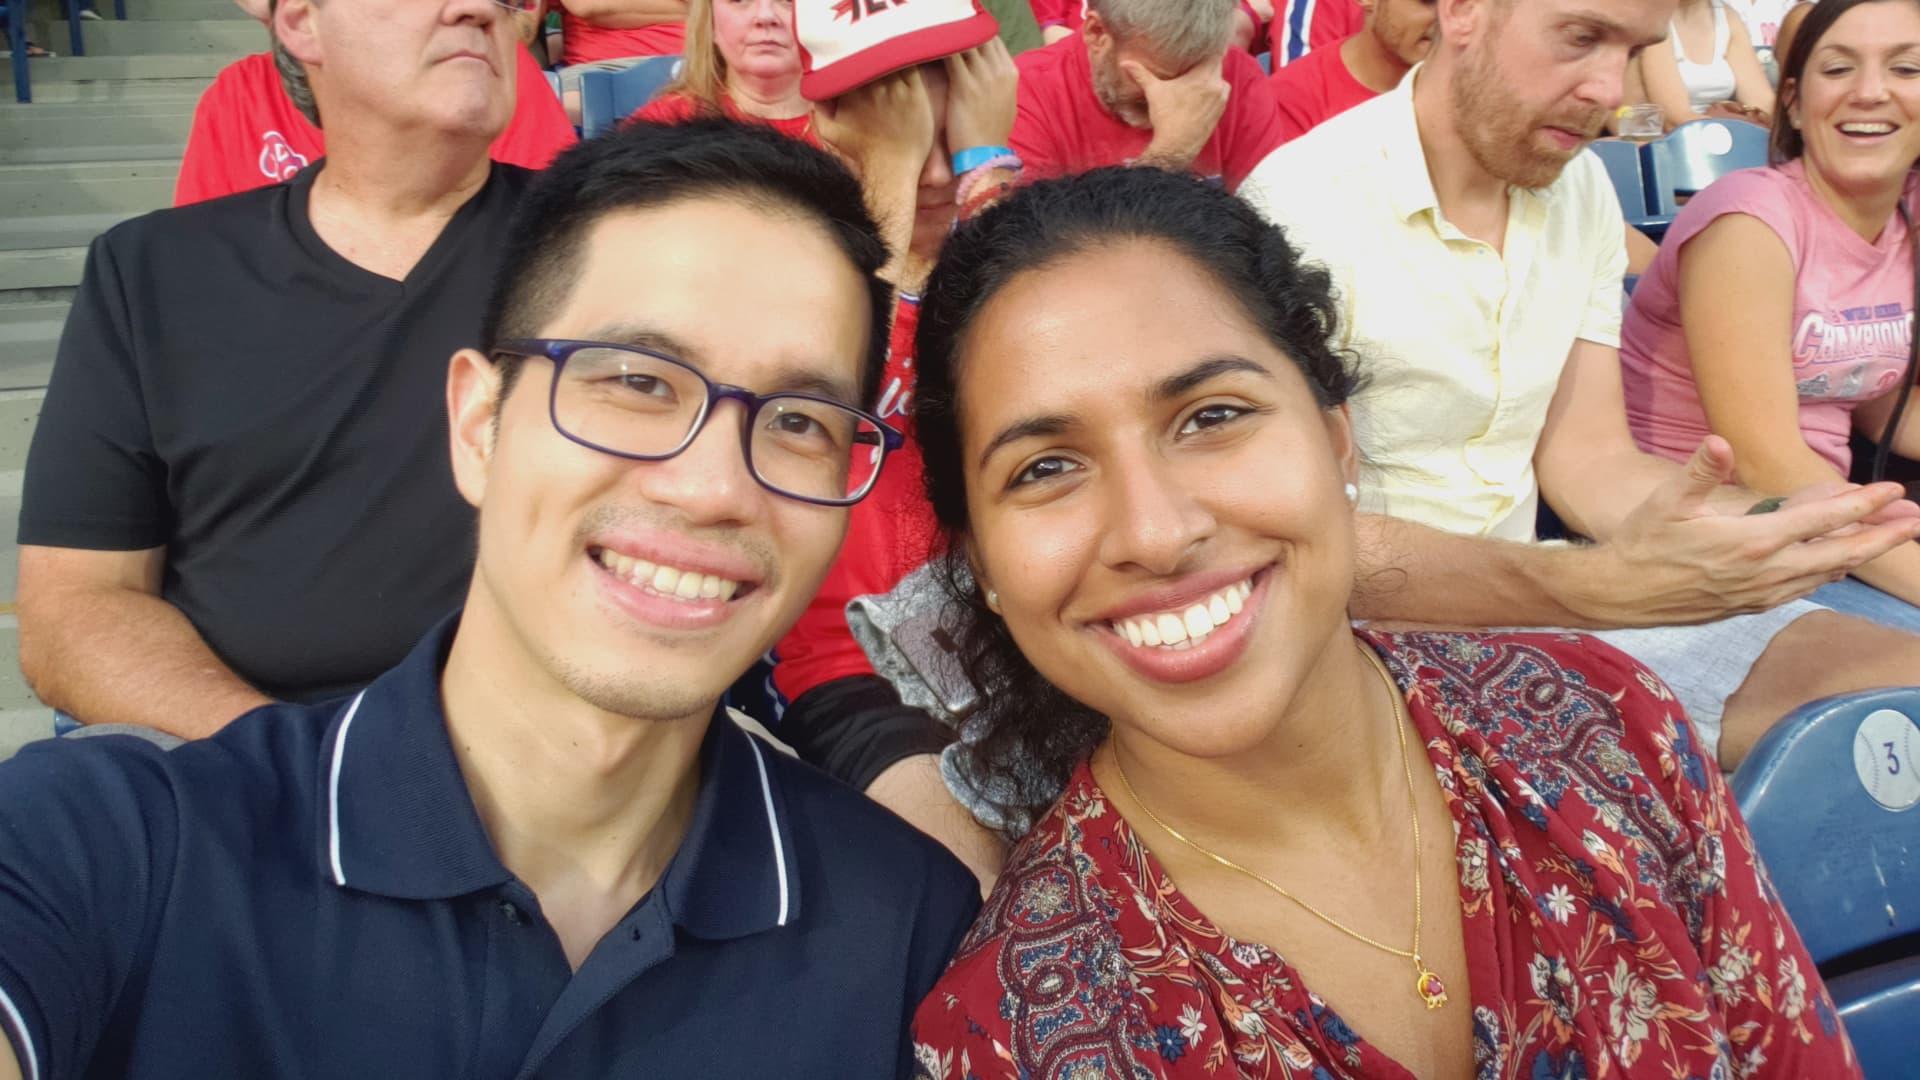 Tiu and Chorath attend a Phillies baseball game.